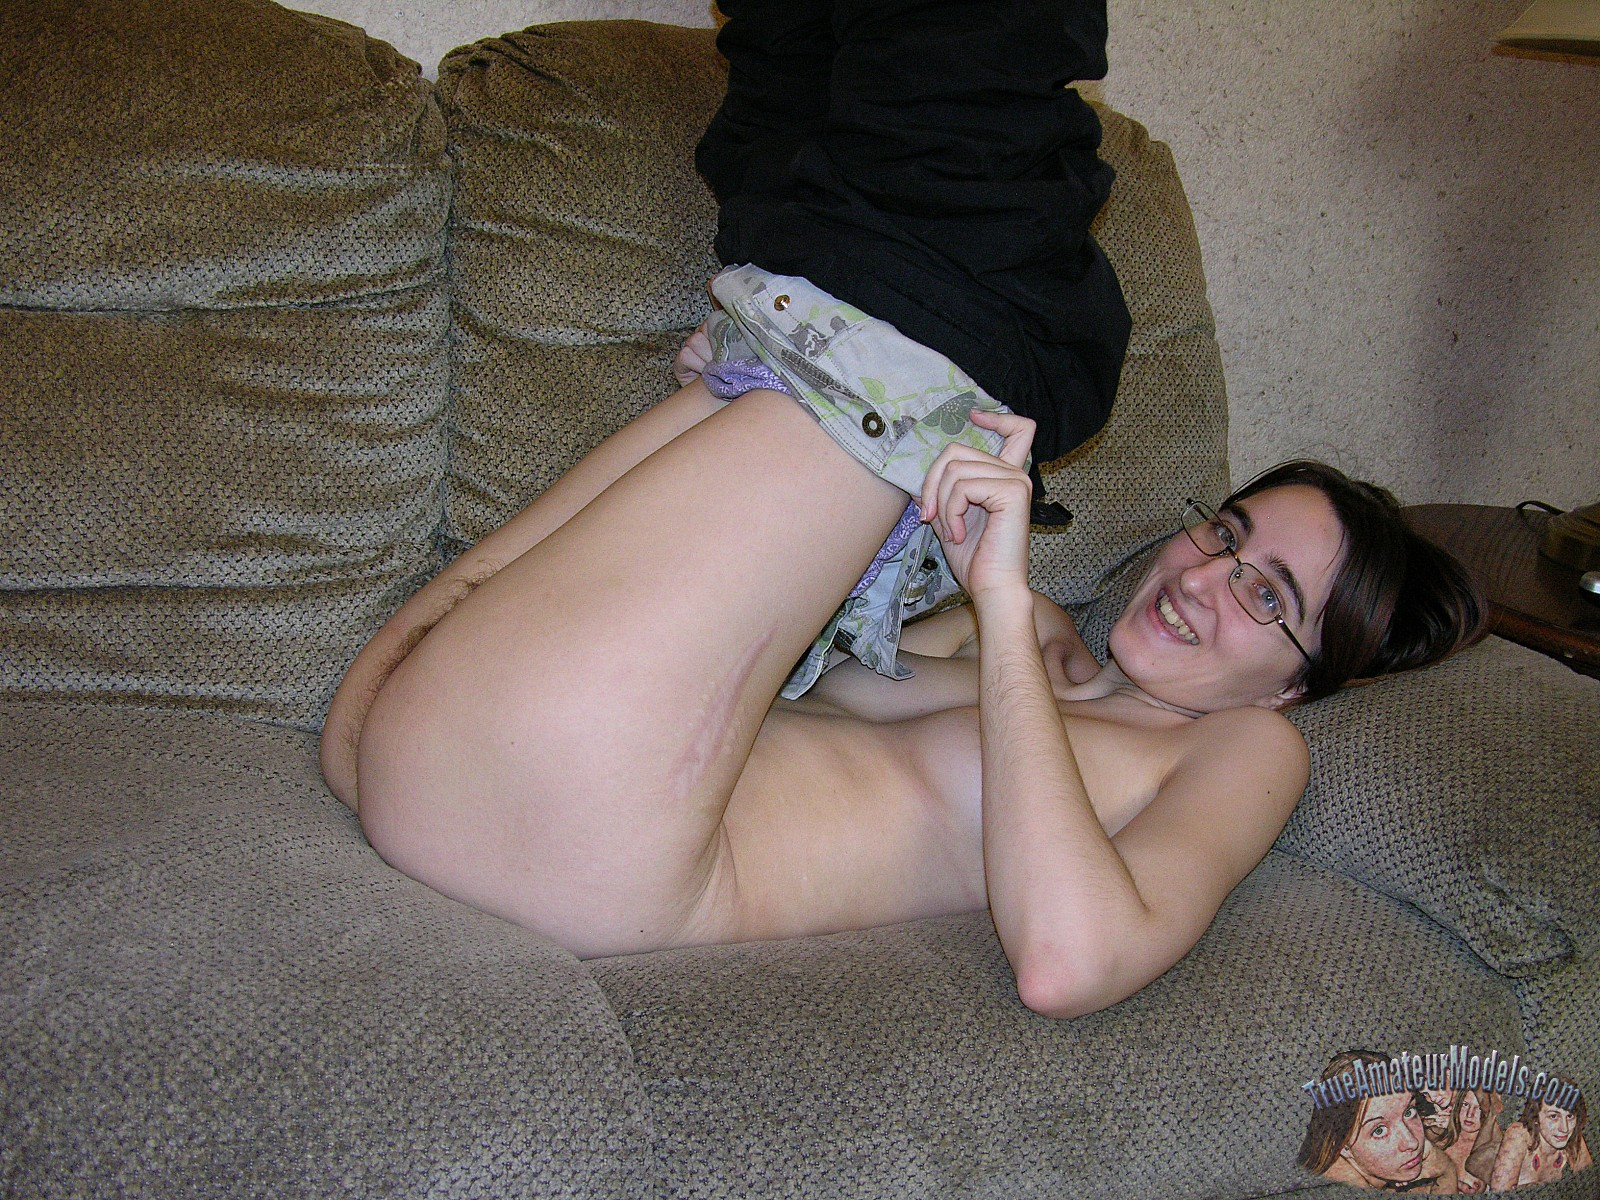 naked photos of american pie movie xxx seans